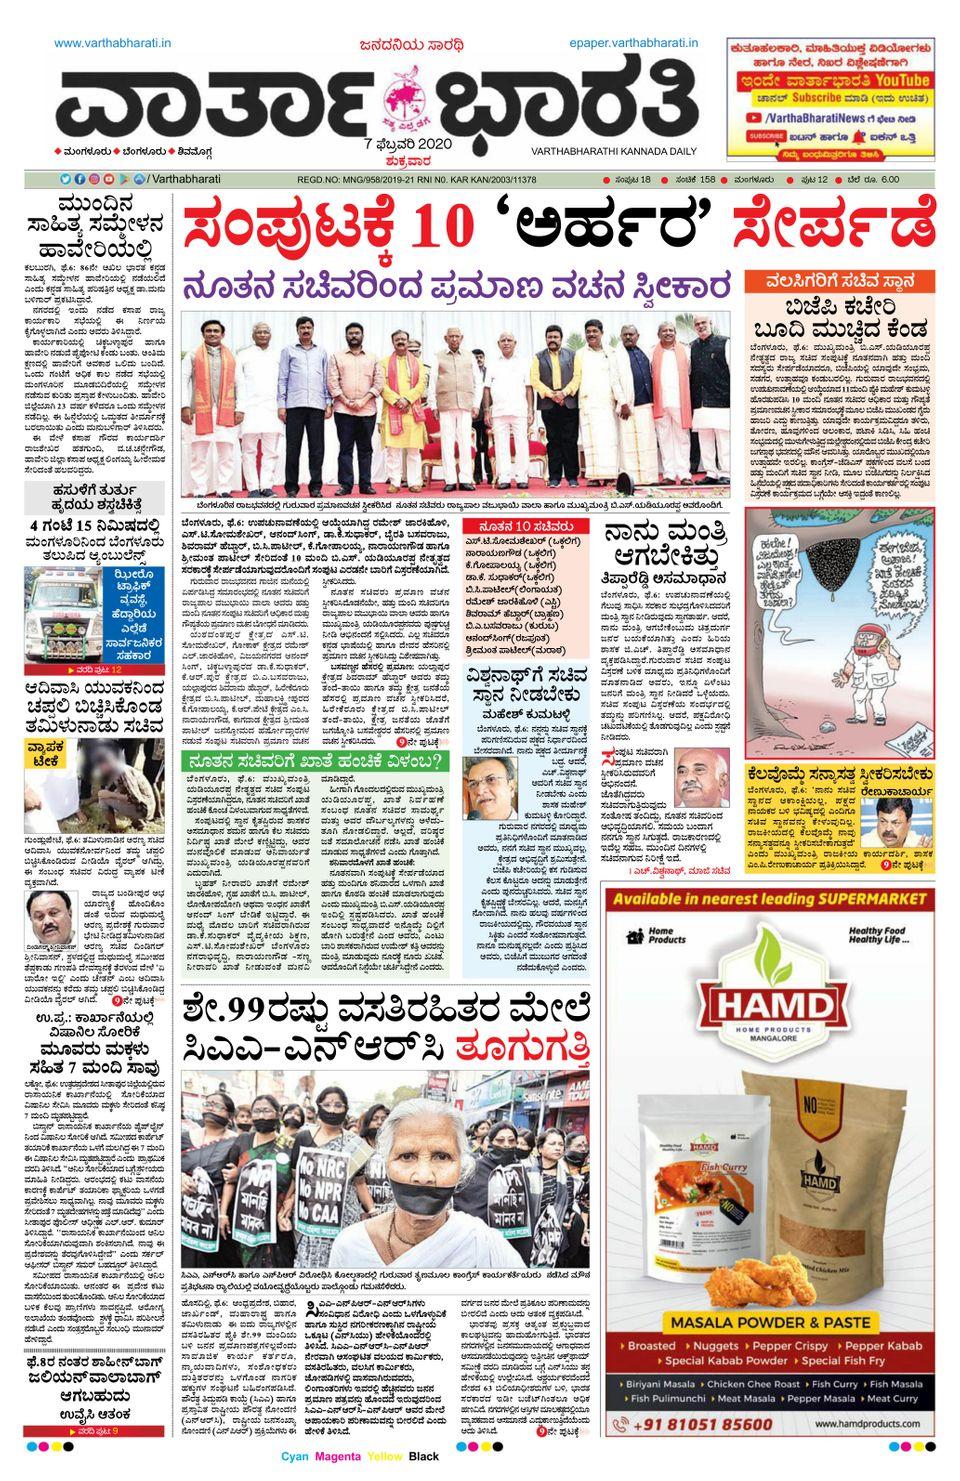 Get Your Digital Copy Of Vartha Bharati Mangalore 07 Feb 2020 Issue